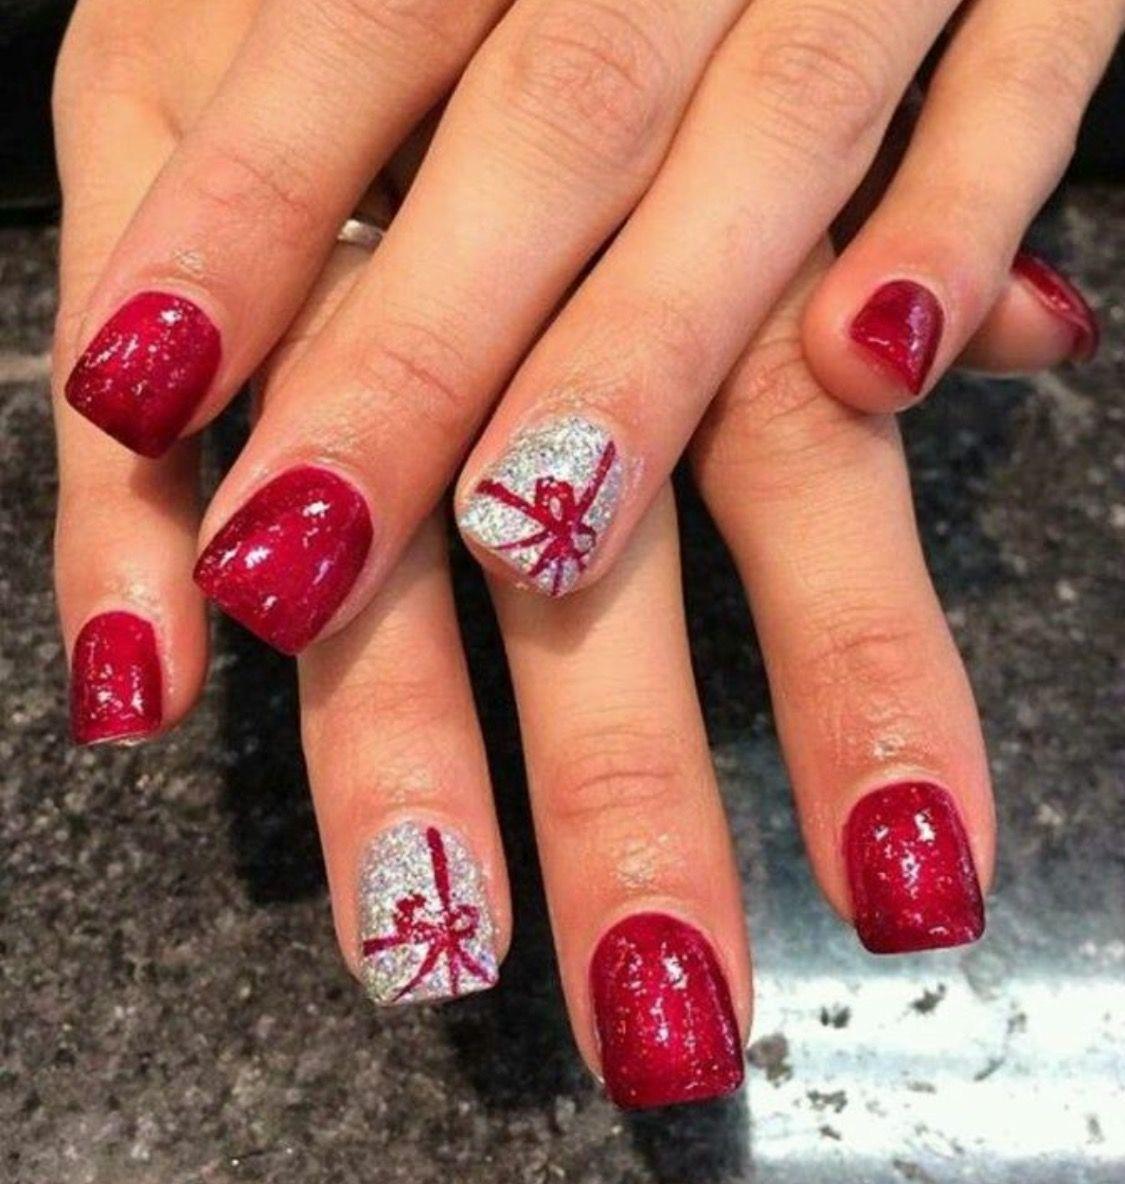 Christmas nails | nails | Pinterest | Manicure, Pedi and Mani pedi